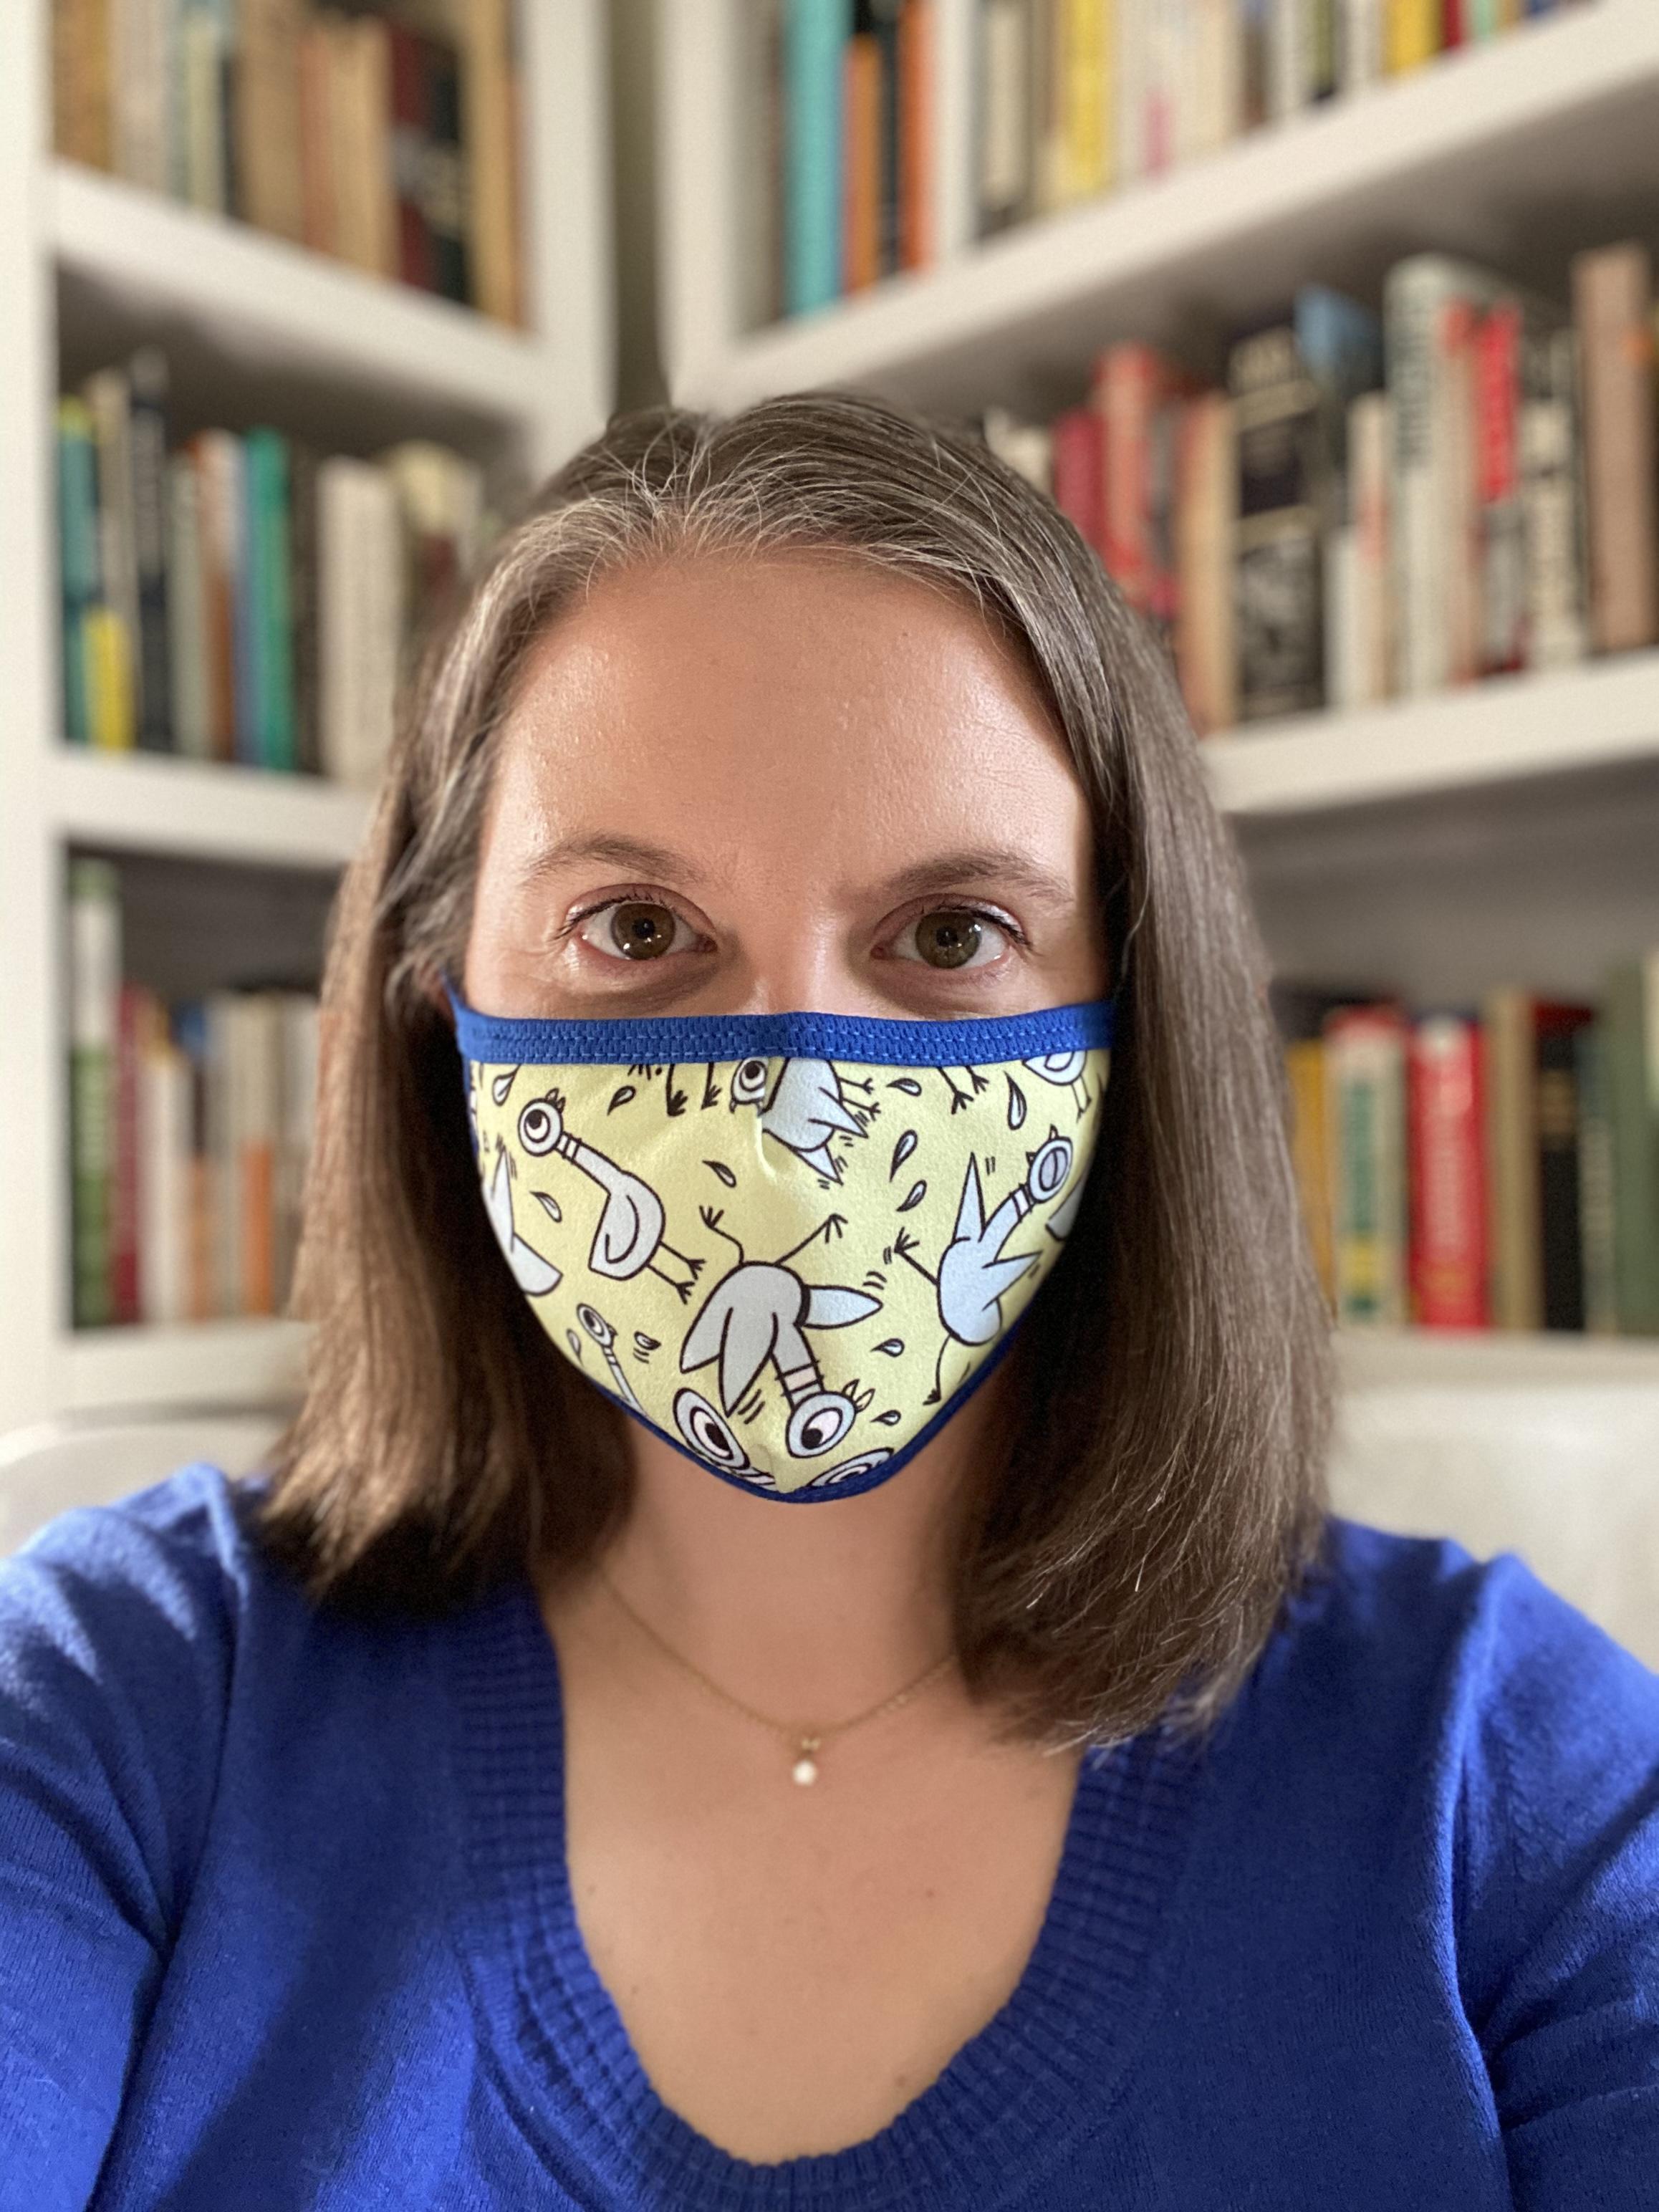 Mrs. Wajda with a mask